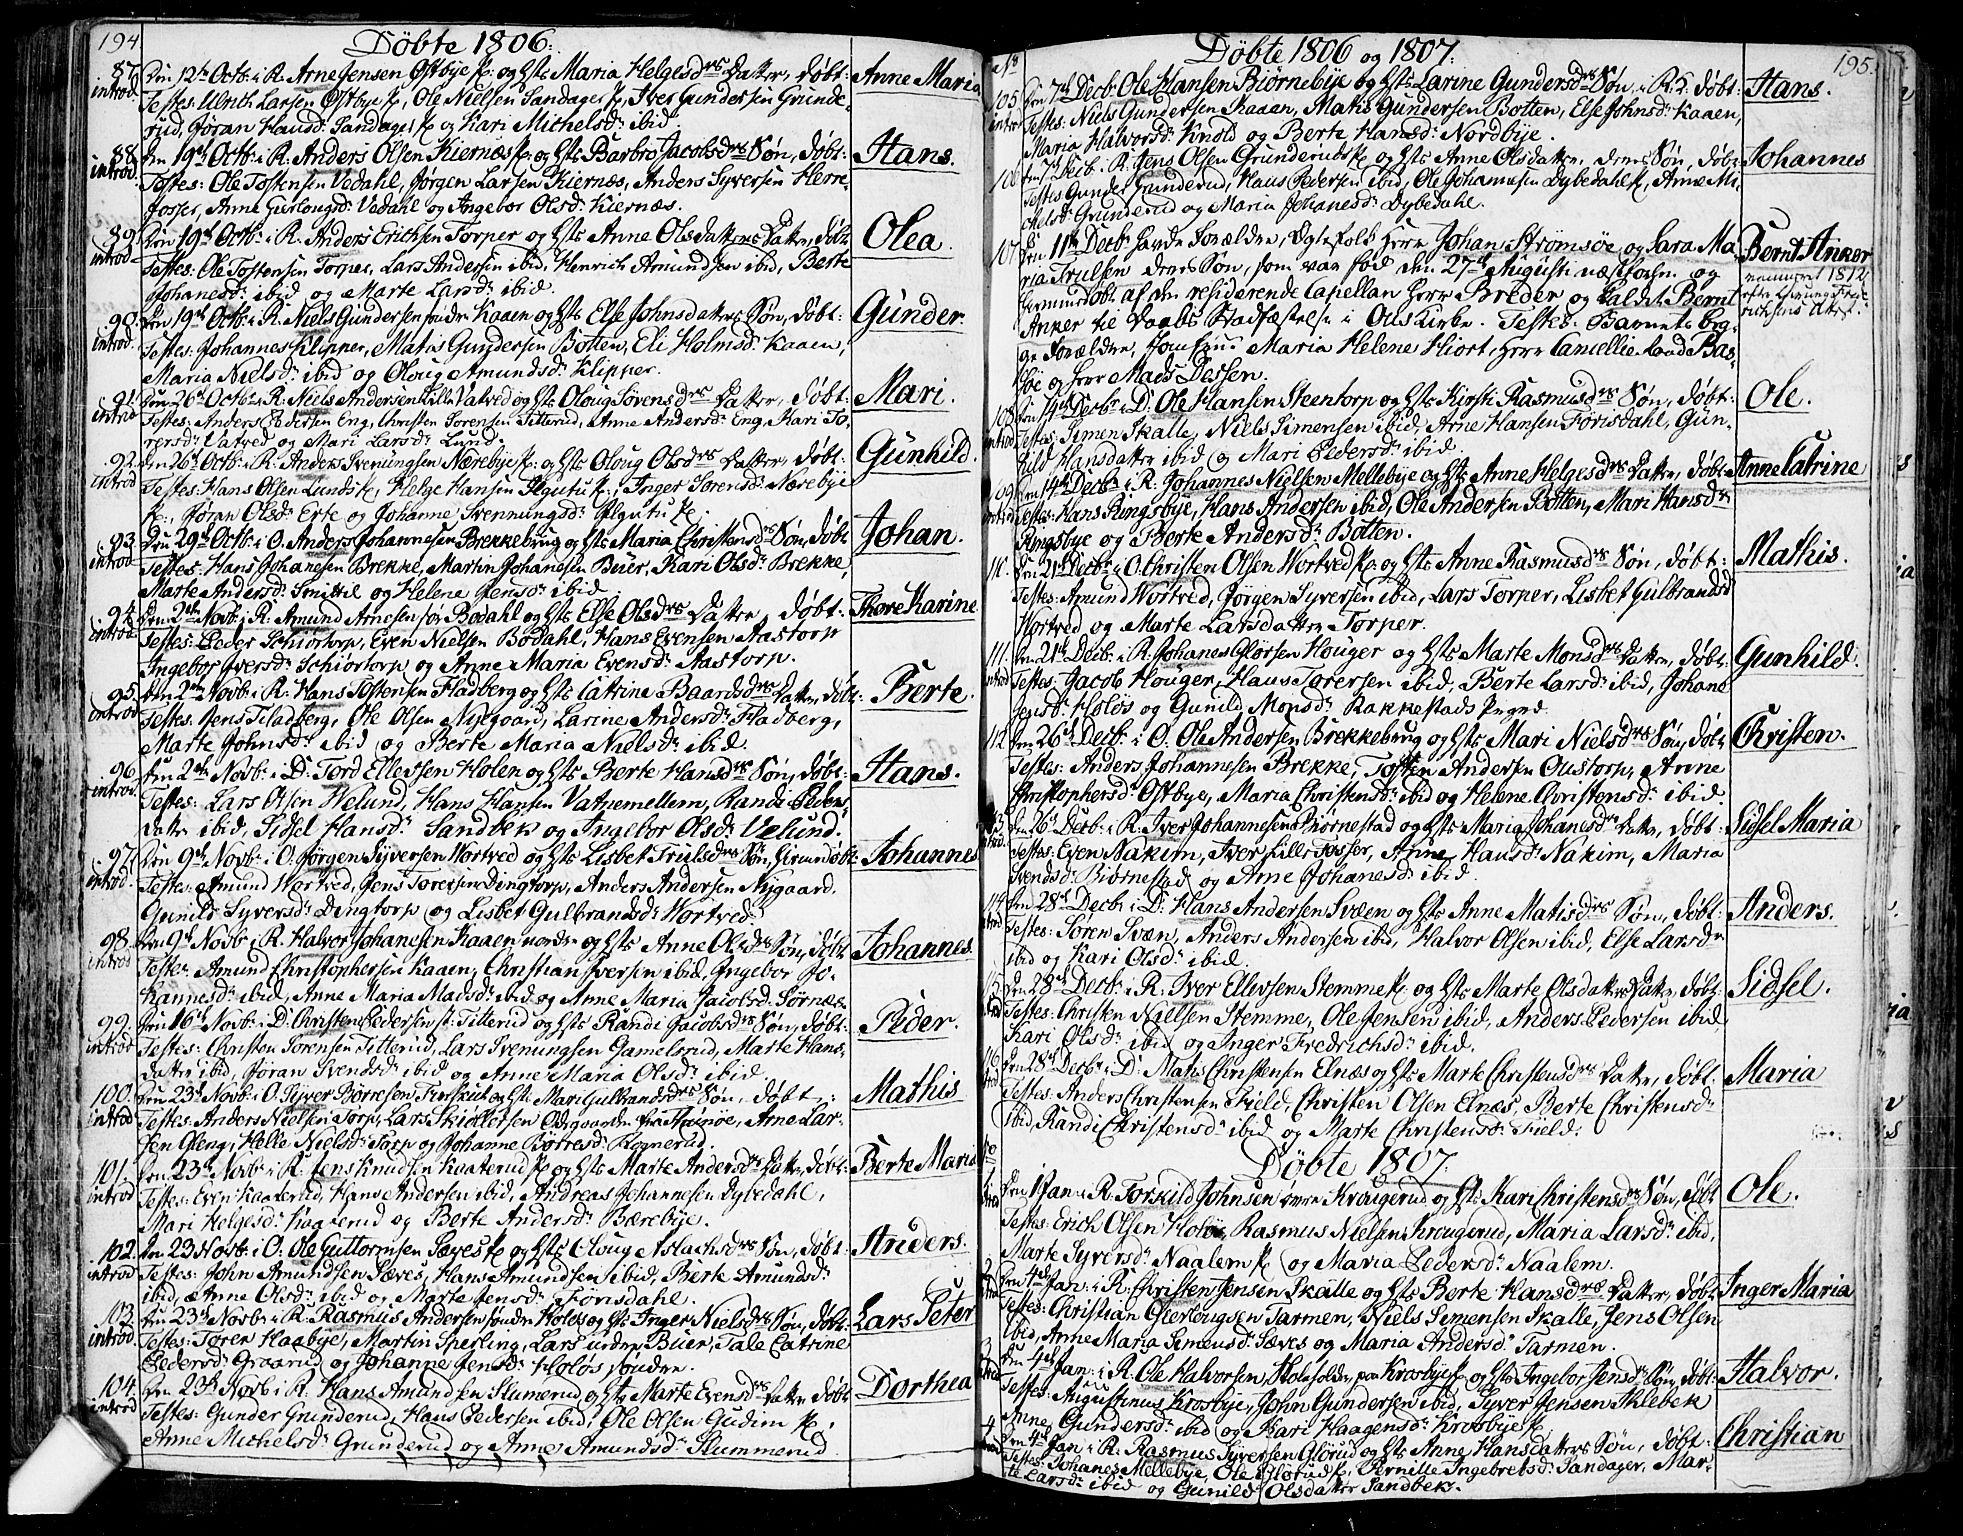 SAO, Rakkestad prestekontor Kirkebøker, F/Fa/L0005: Ministerialbok nr. I 5, 1784-1814, s. 194-195